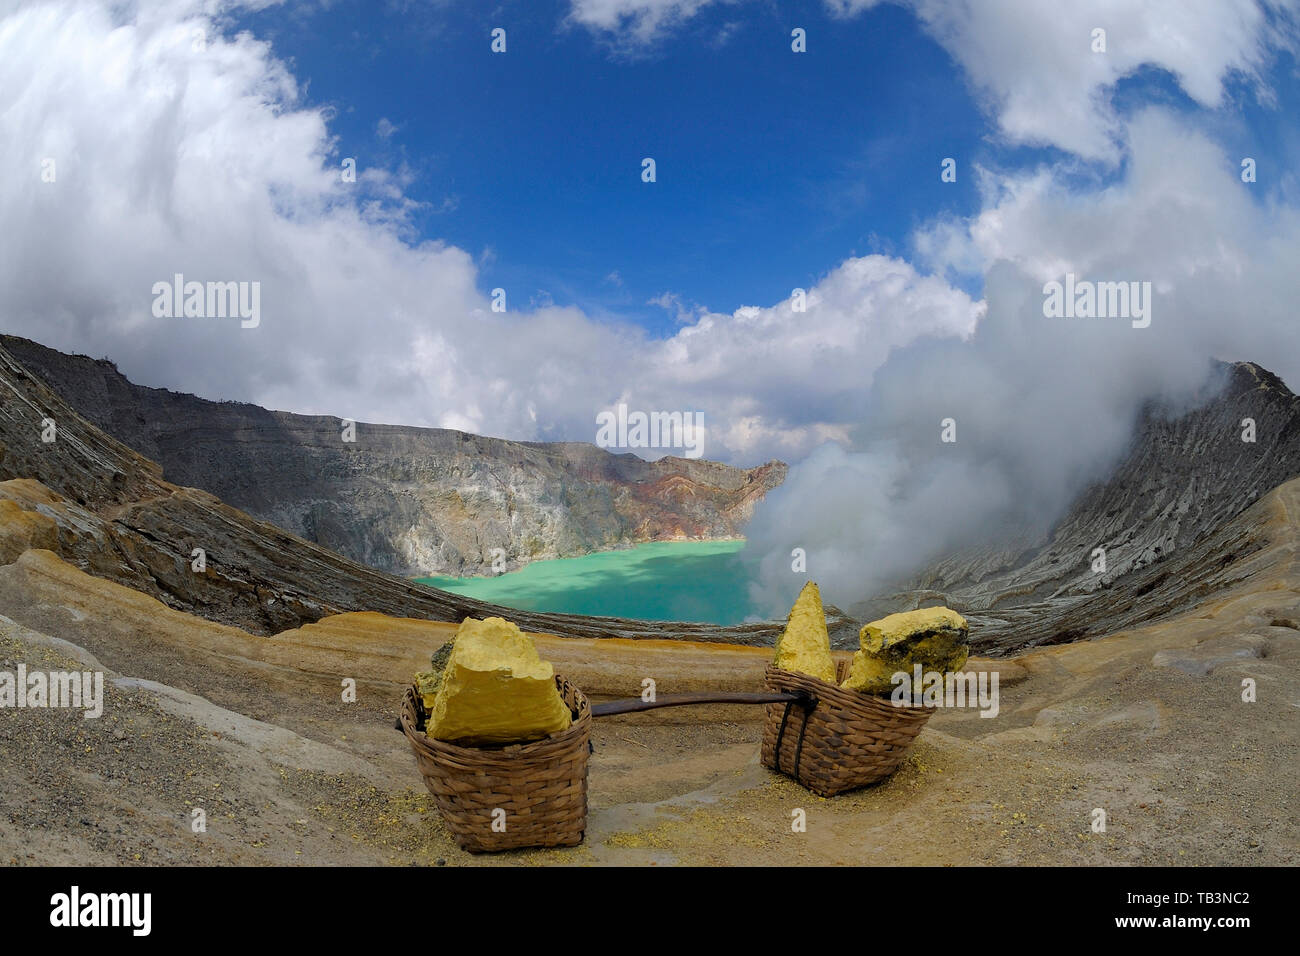 Schwefel Felsen in Körbe ausgehende Schwefel Dampf bei volcany Komplex, Crater Lake Kawah, Kawah Ijen, Besuki, Ijen, Java, Indonesien Stockbild